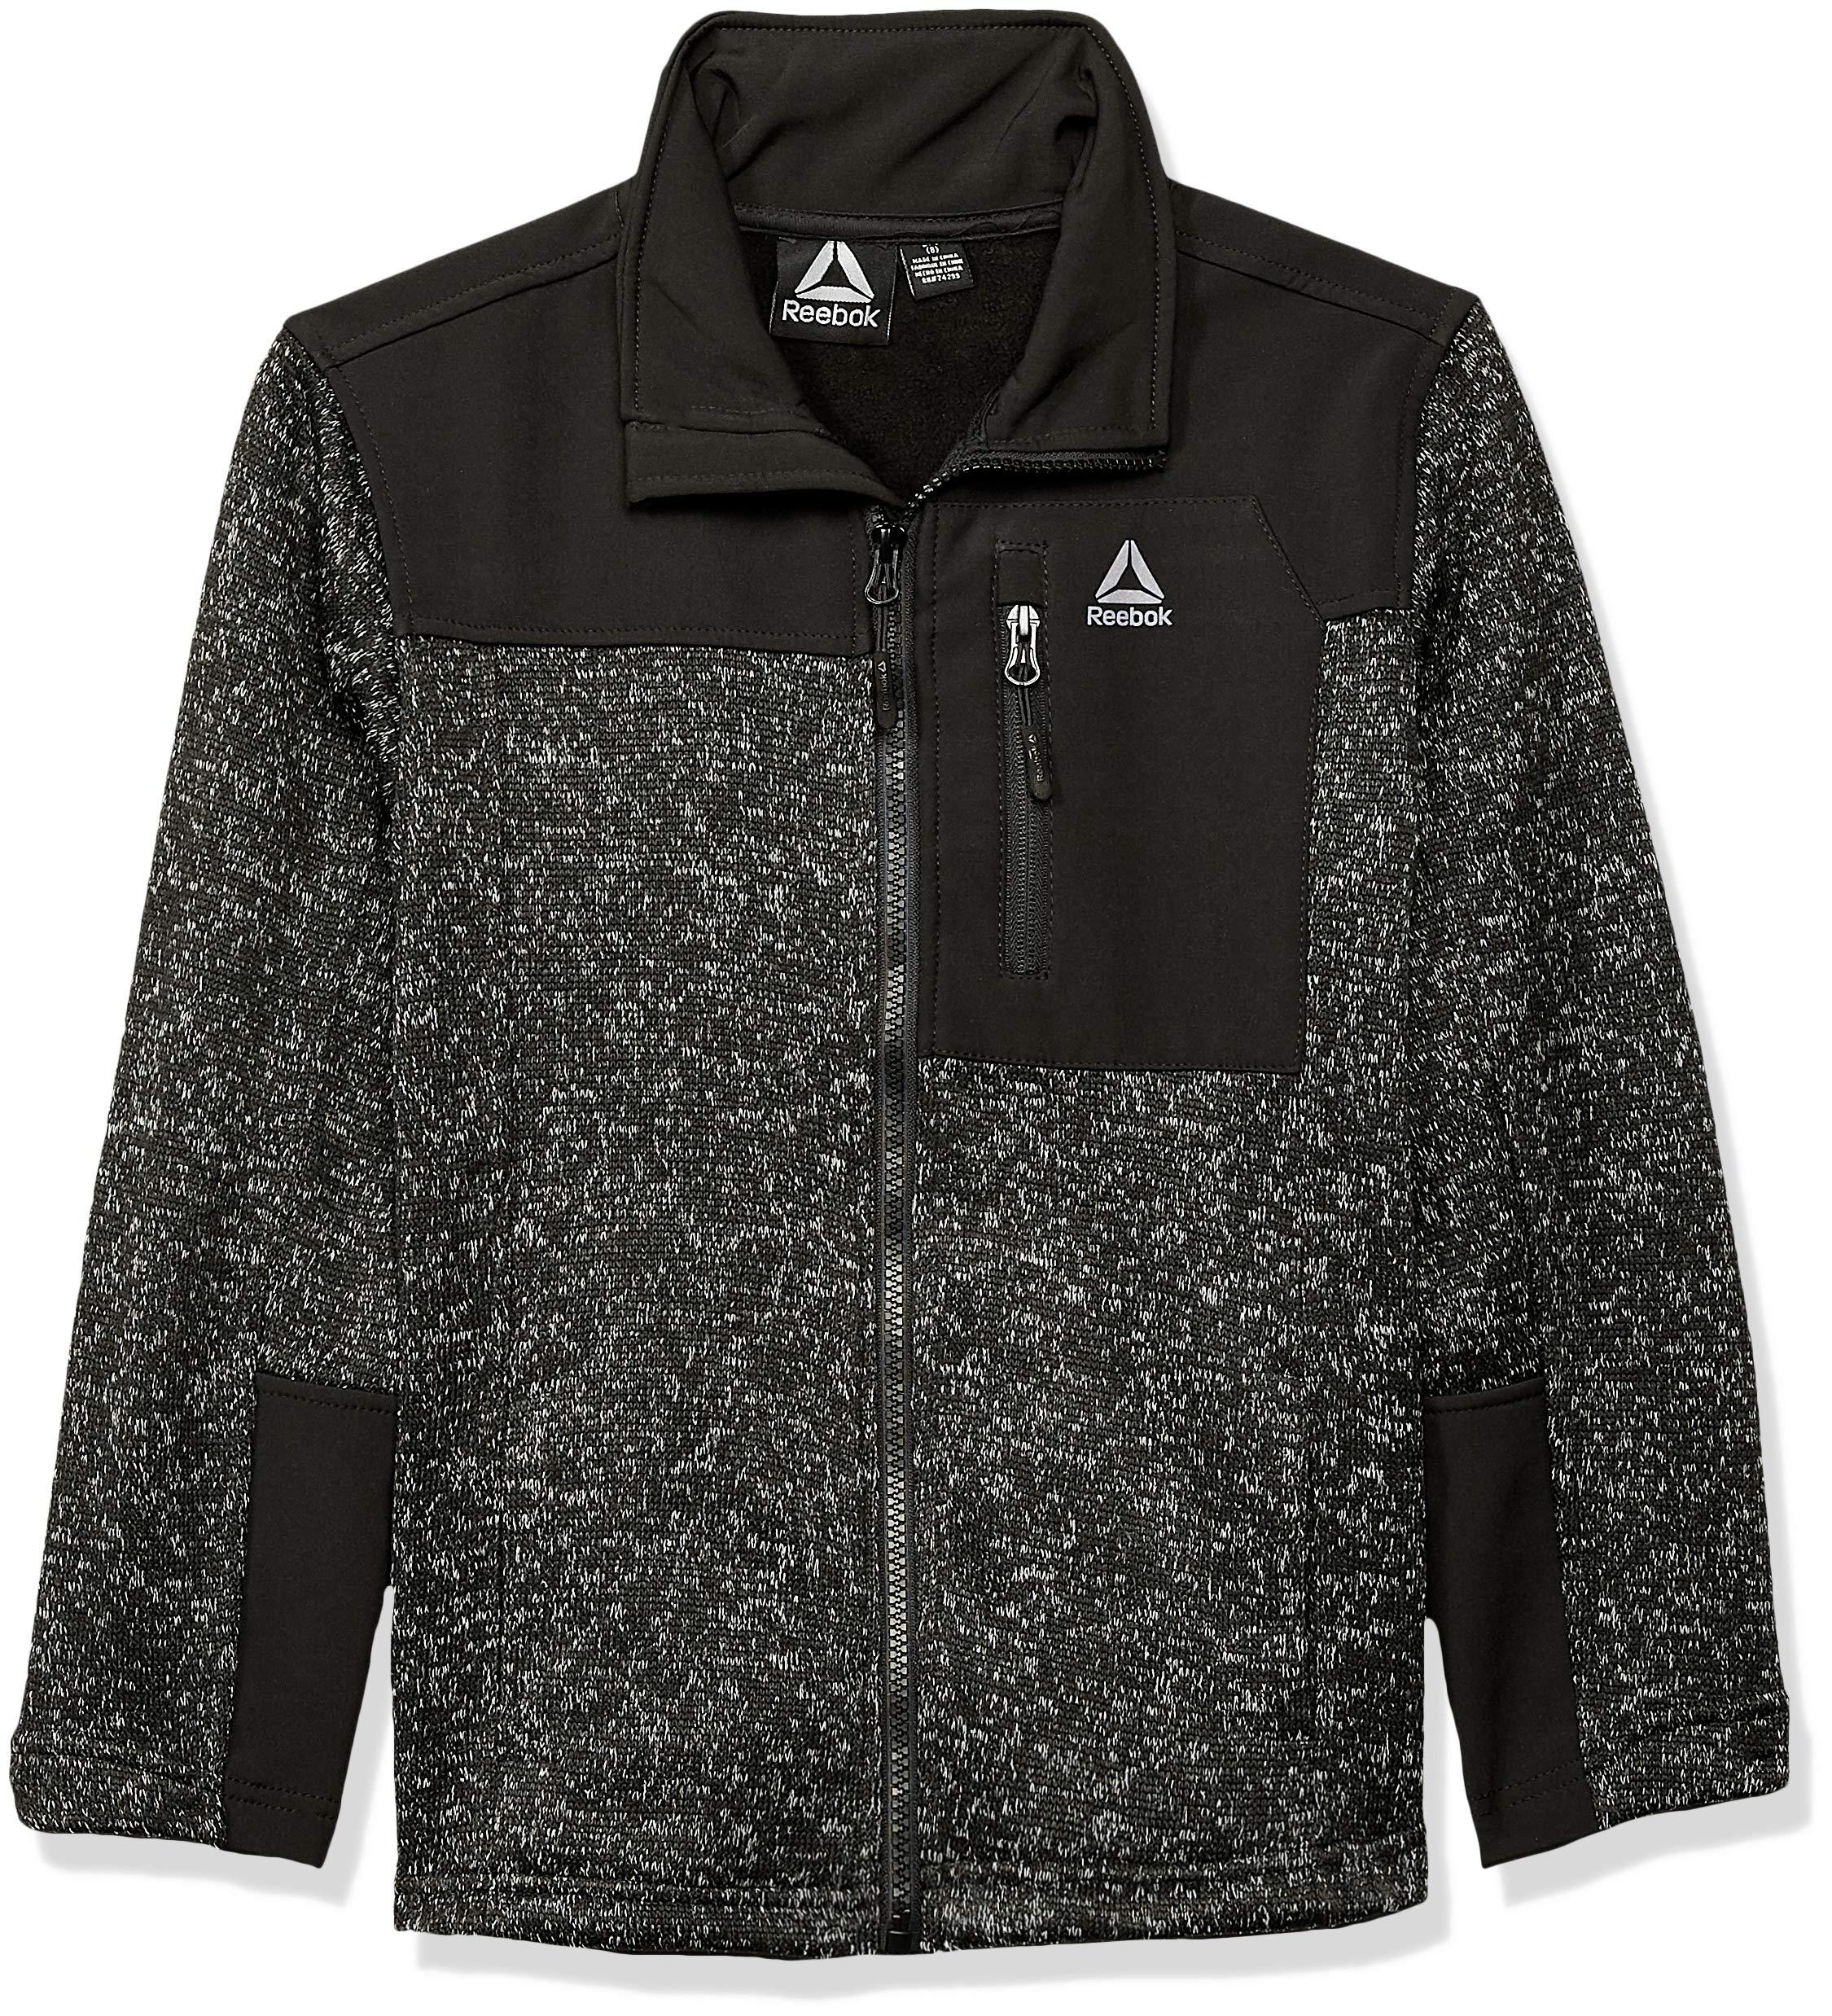 Reebok Boys' Big Active Sweater Fleece Jacket, Black Heather, 8